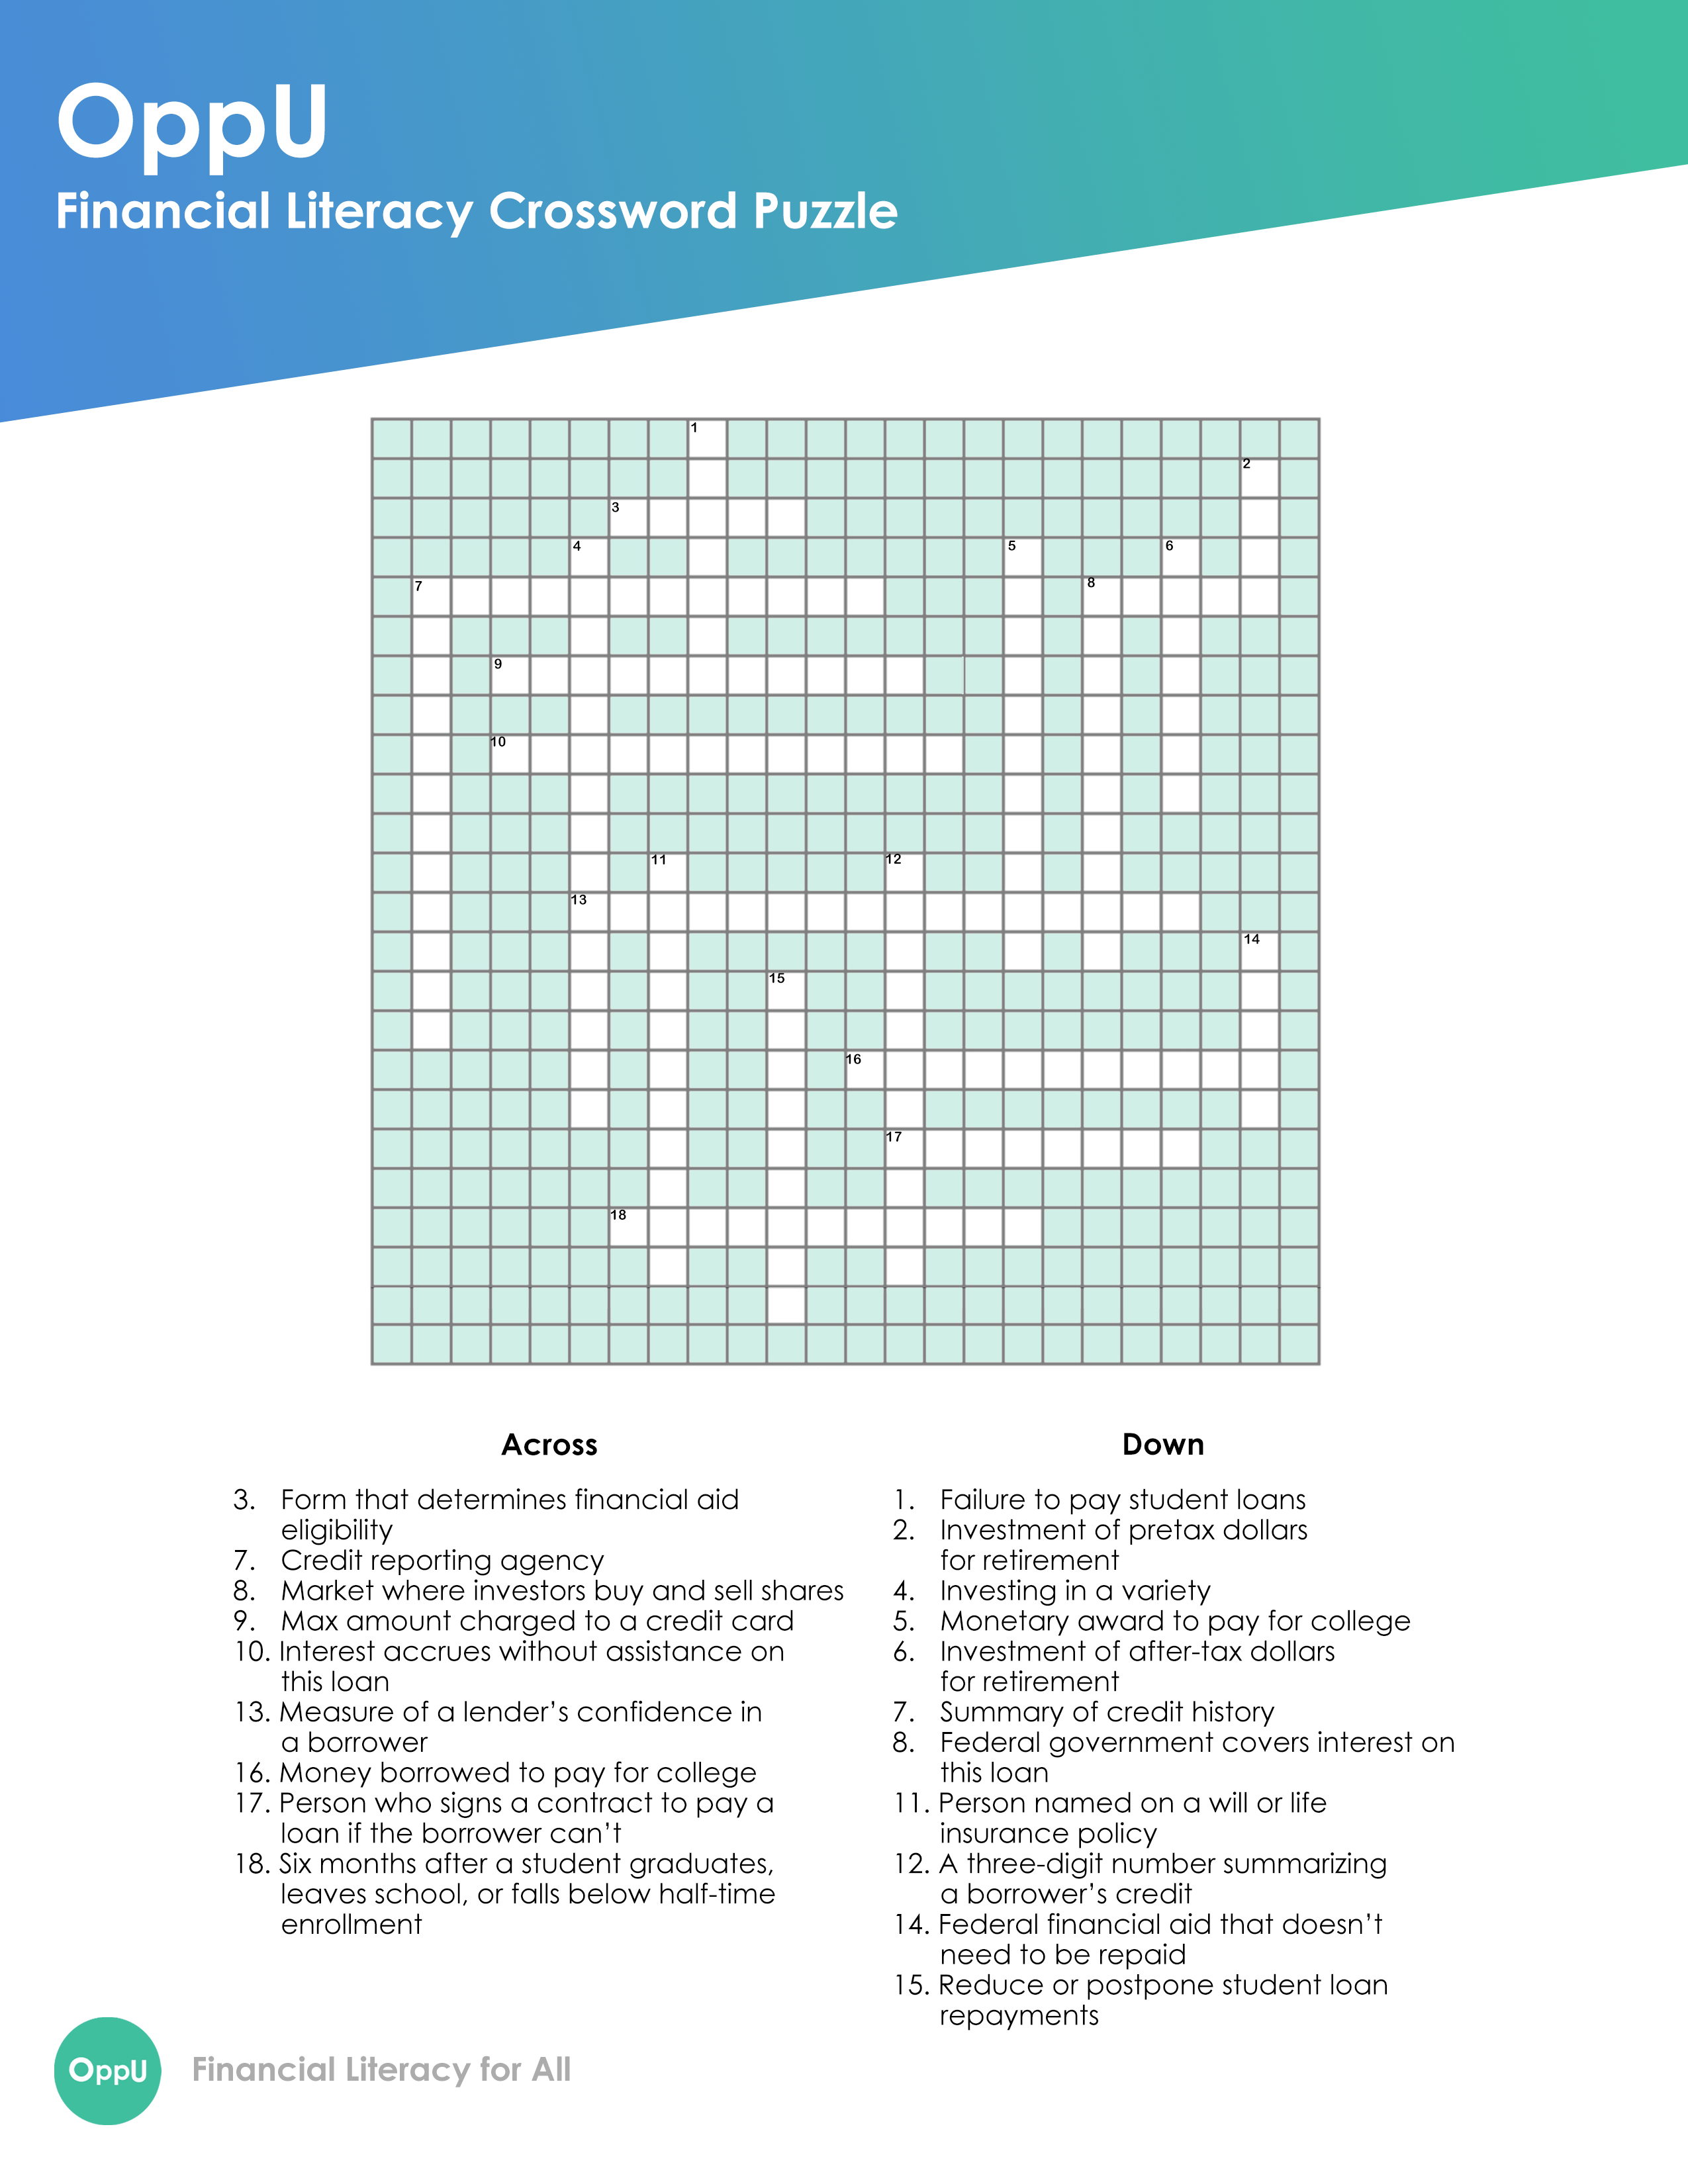 OppU Advanced Crossword Puzzle